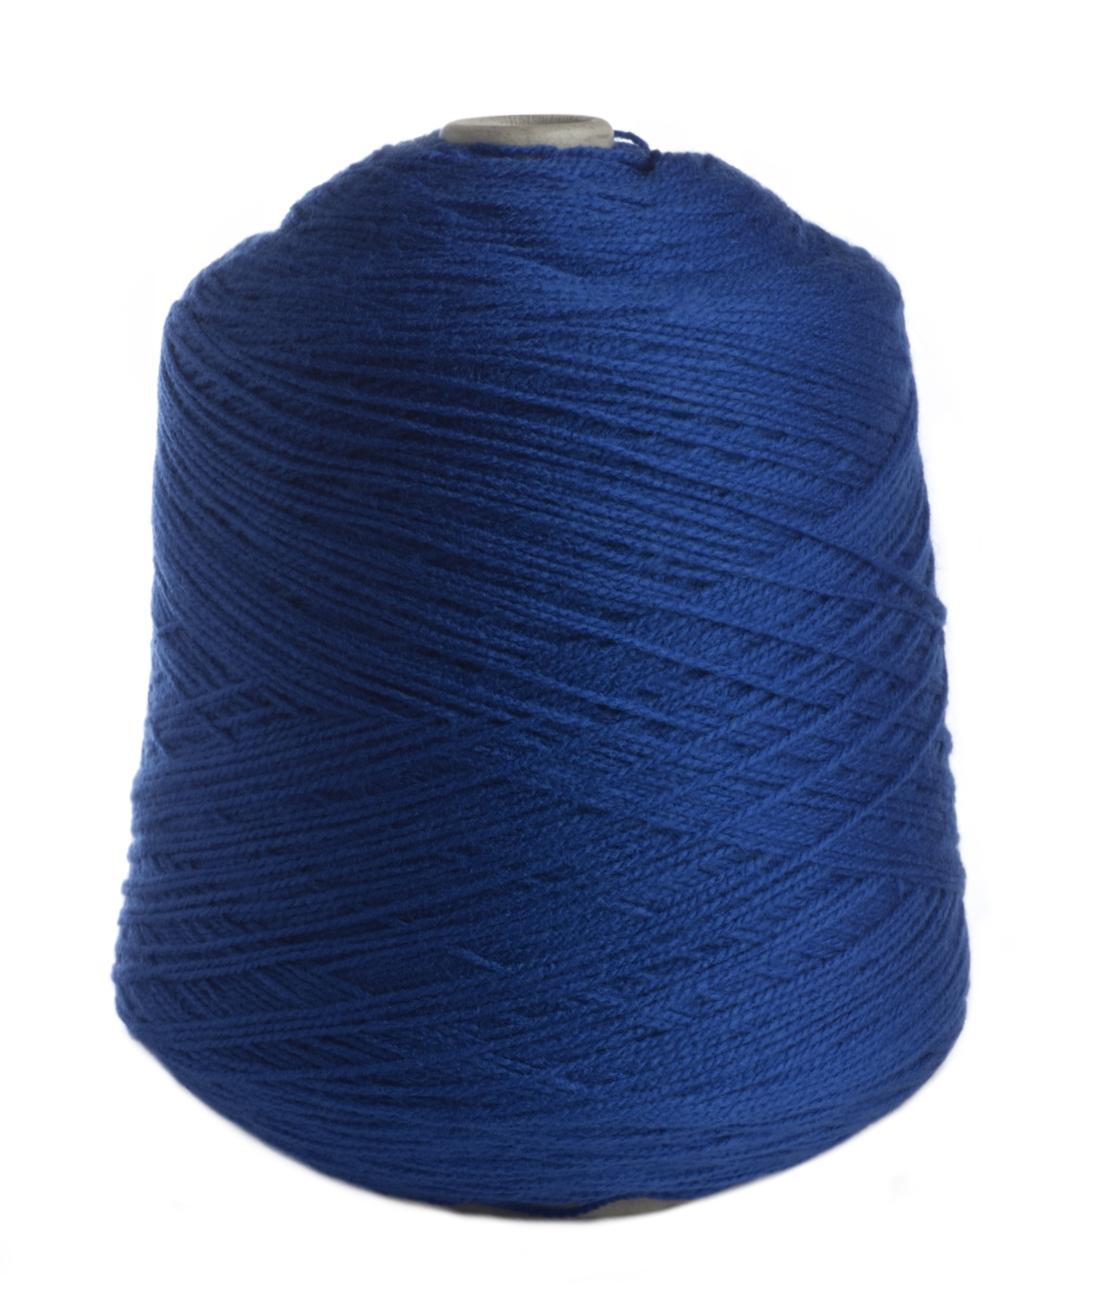 James brett 500g cone hand or machine 4ply knitting yarn for Craft with woolen thread